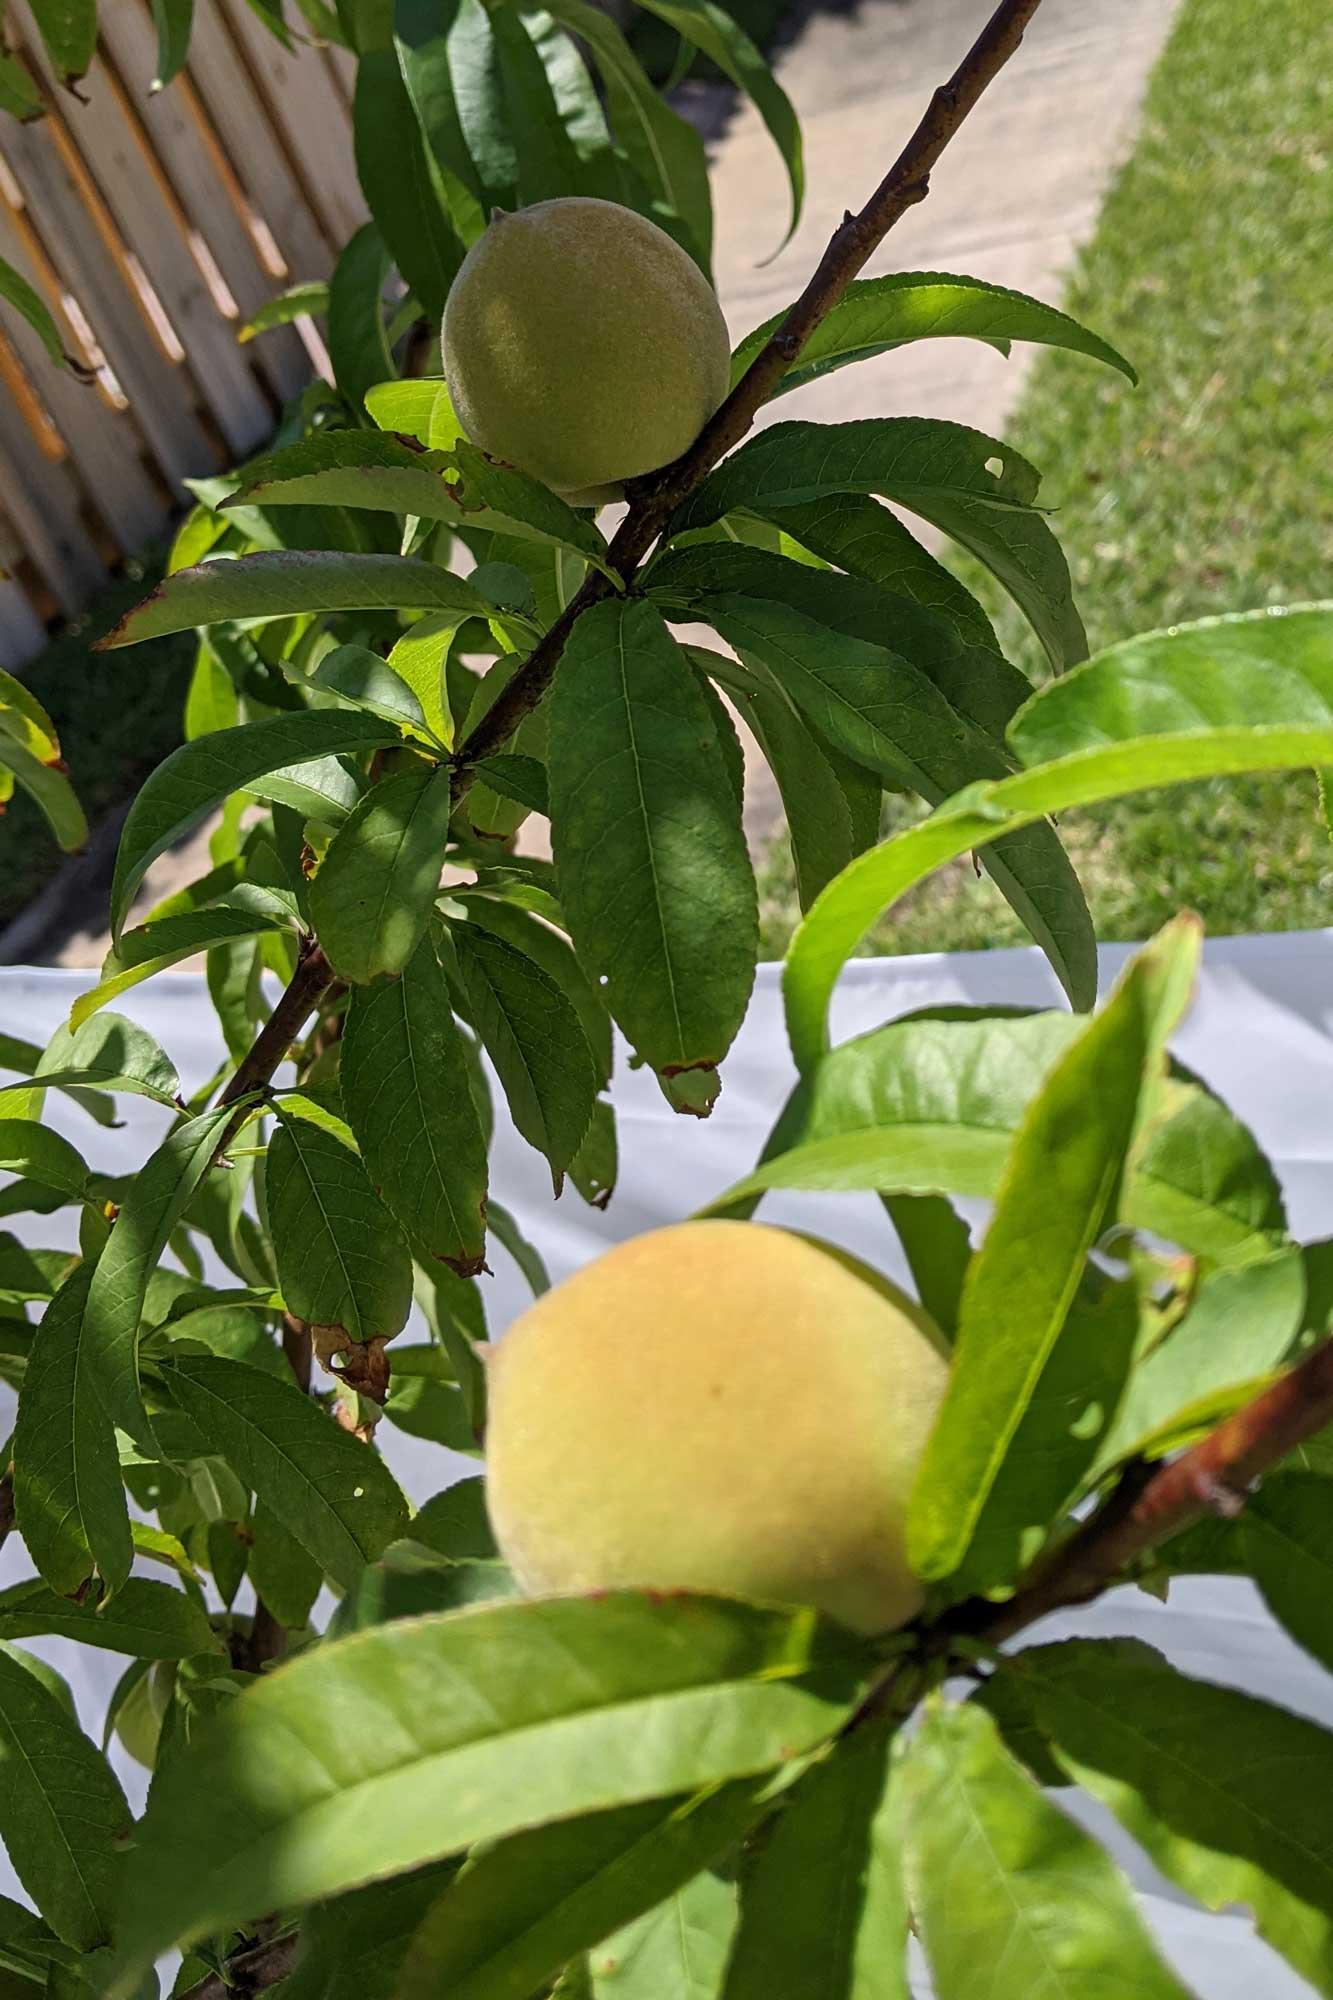 Tropic Snow Peach, April 27, 2021